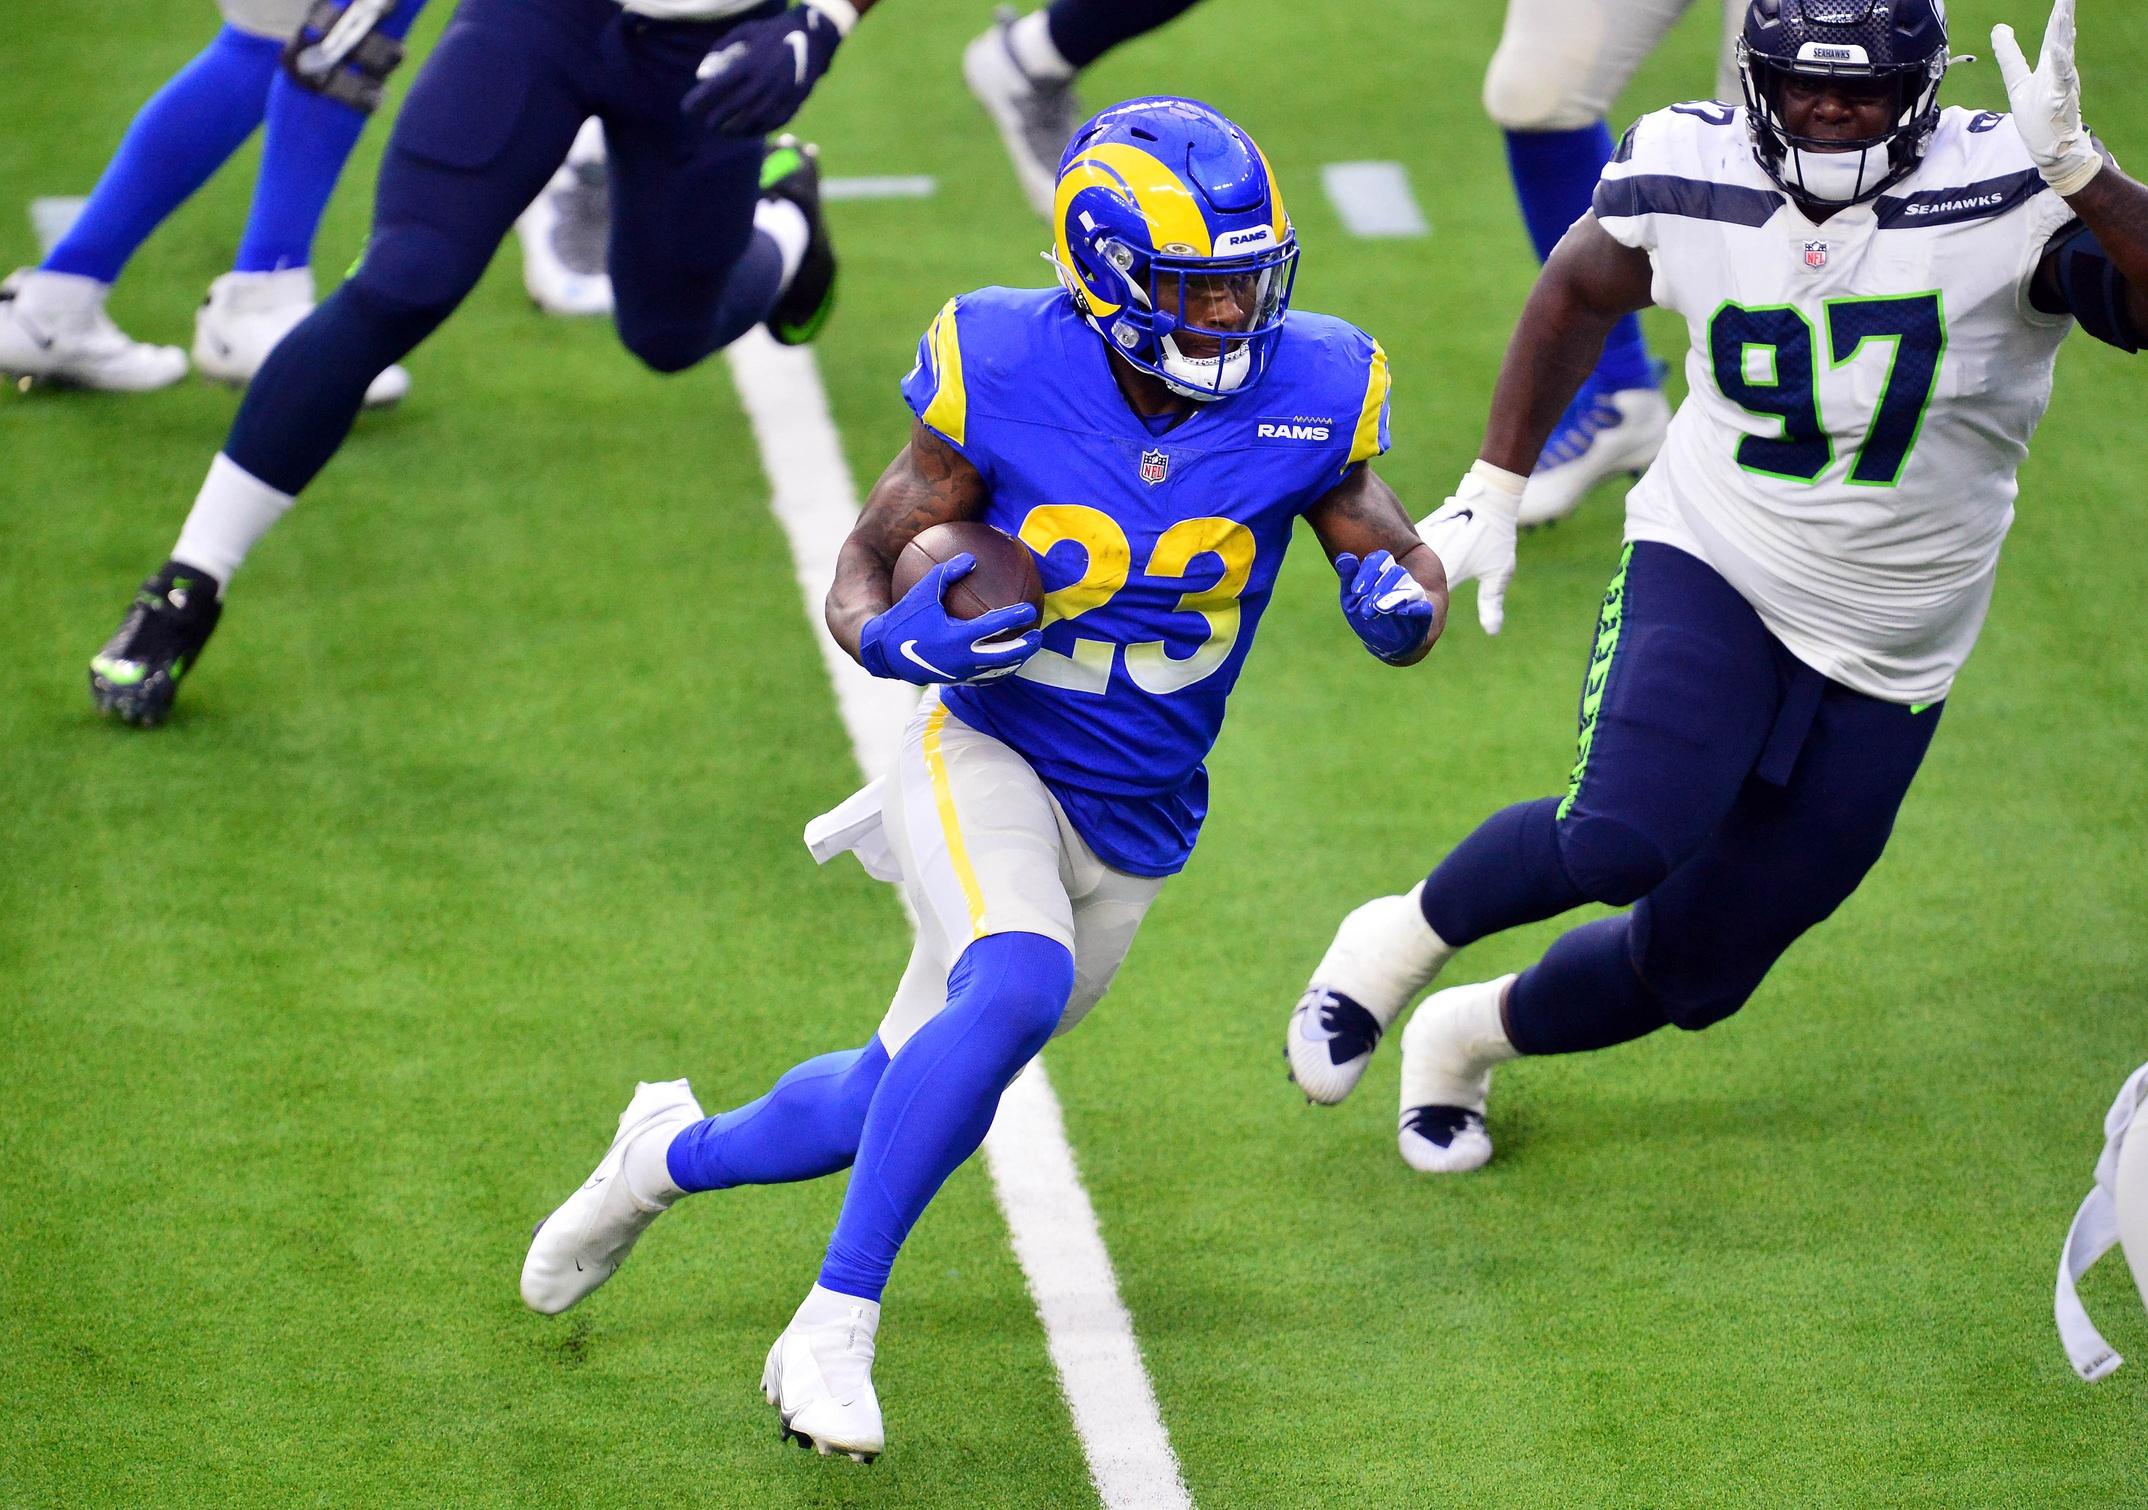 Nfl Week 10 Pff Refocused Los Angeles Rams 23 Seattle Seahawks 16 Nfl News Rankings And Statistics Pff